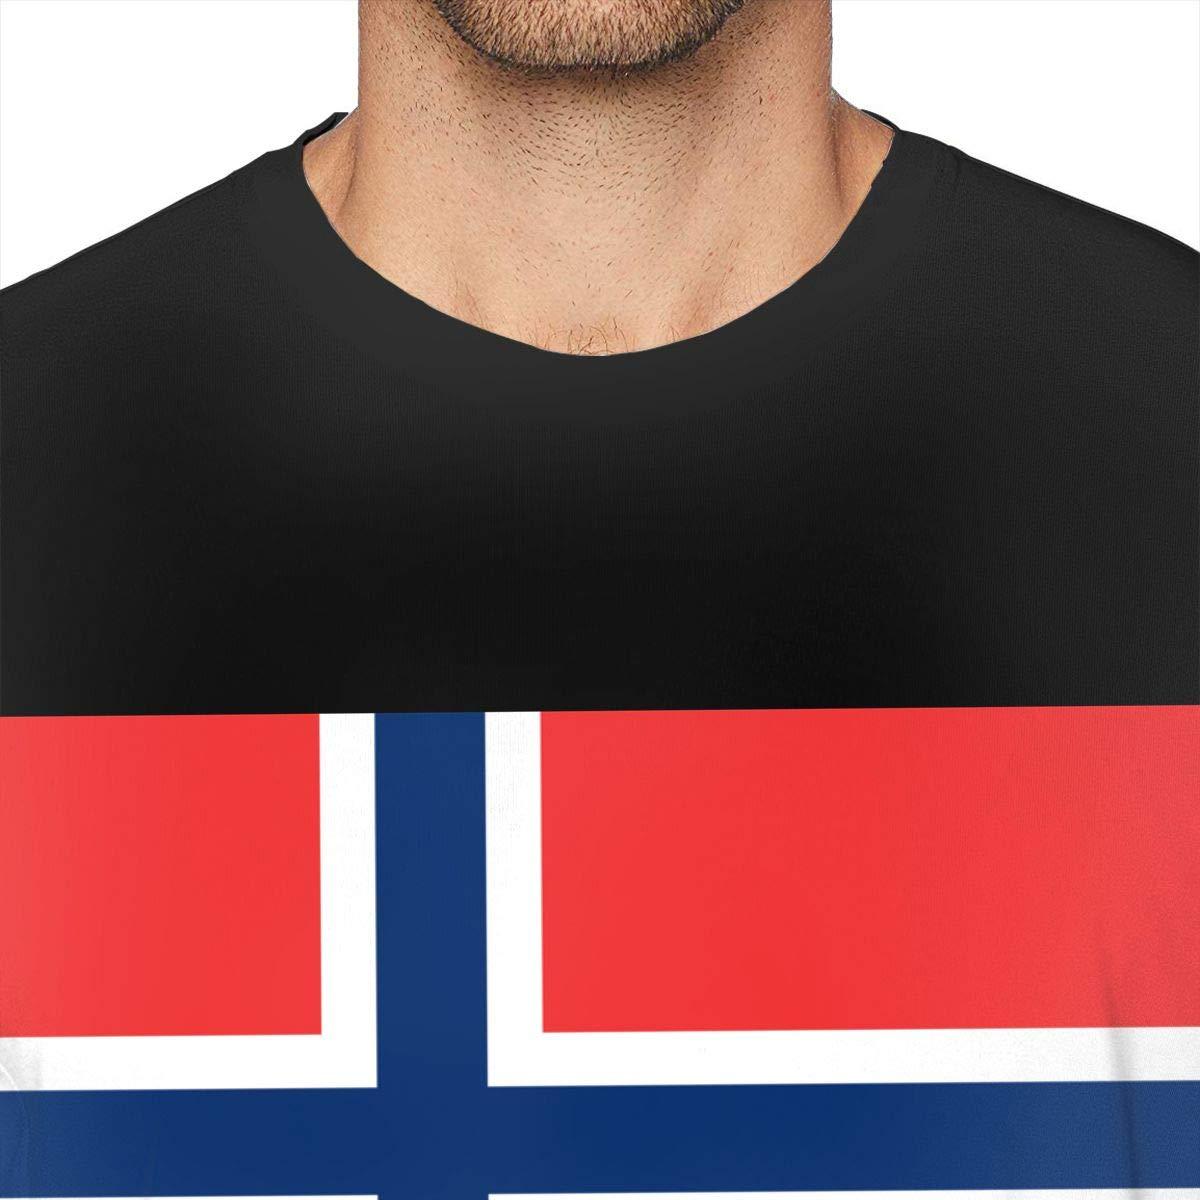 MSKKLA Flag of Norway Patriotic T-Shirt Adult Comfortable Short-Sleeve T-Shirts T-Shirt Plus Size